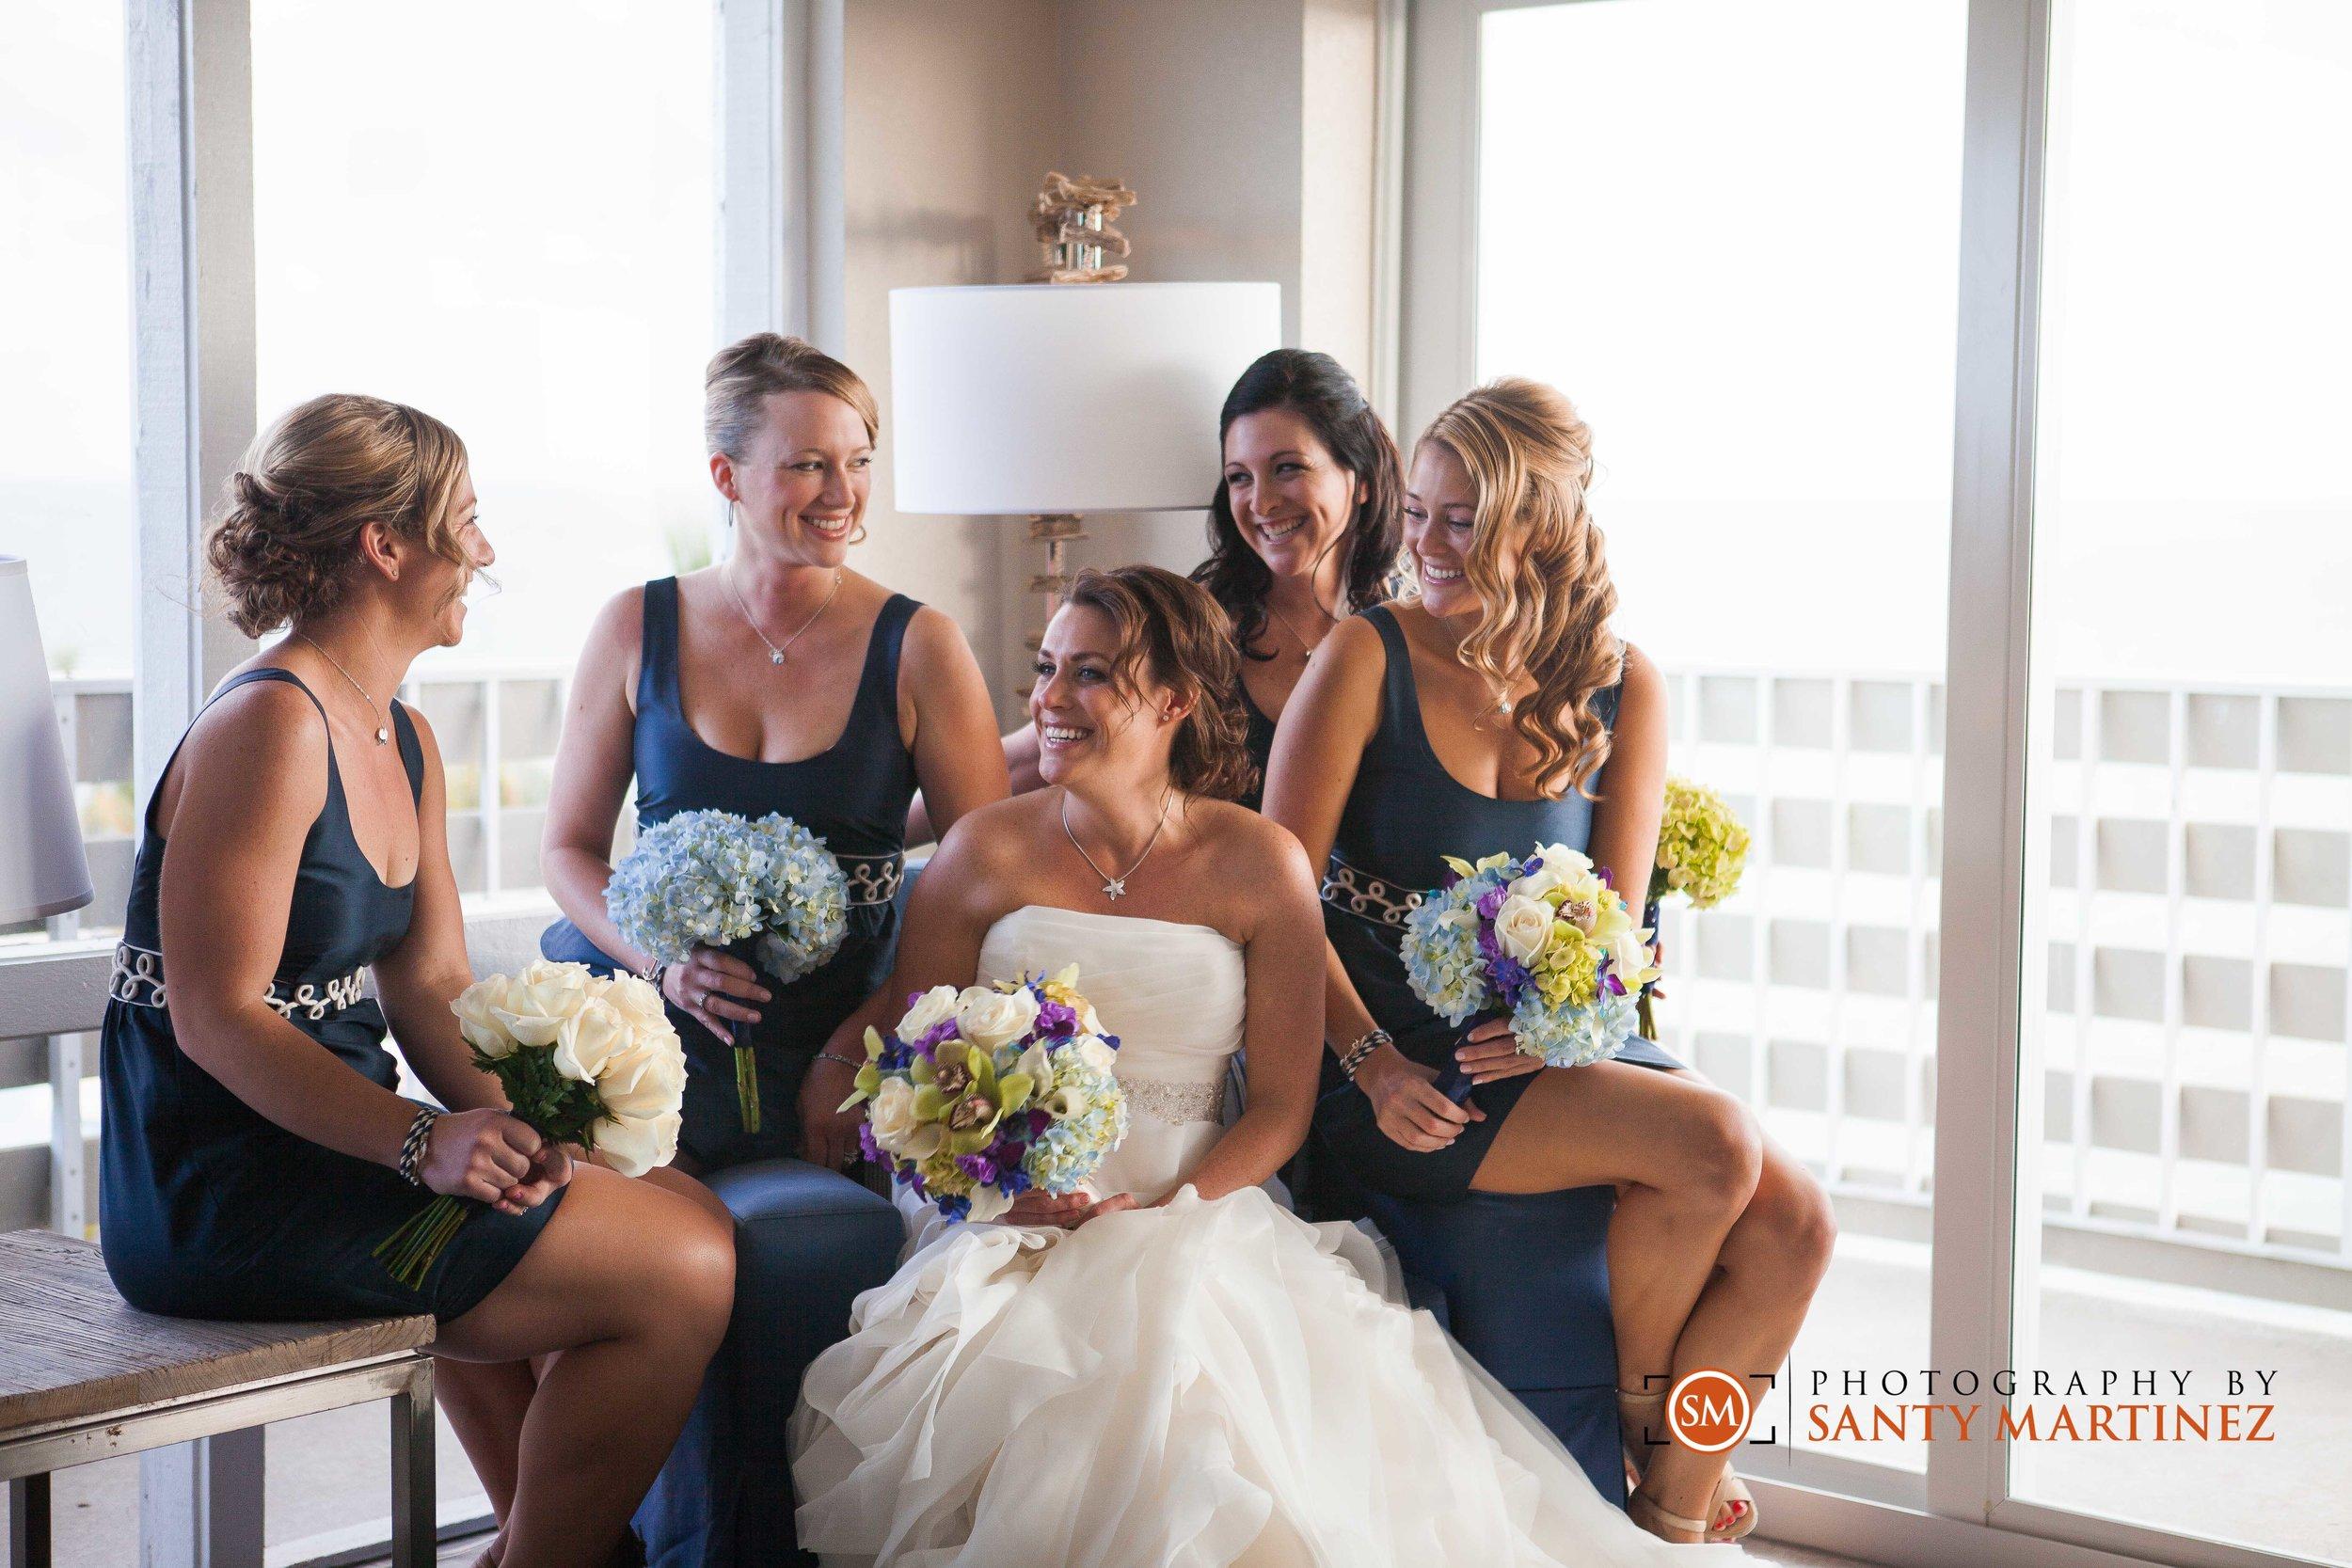 Photography by Santy Martinez - Miami Wedding Photographer-014.jpg